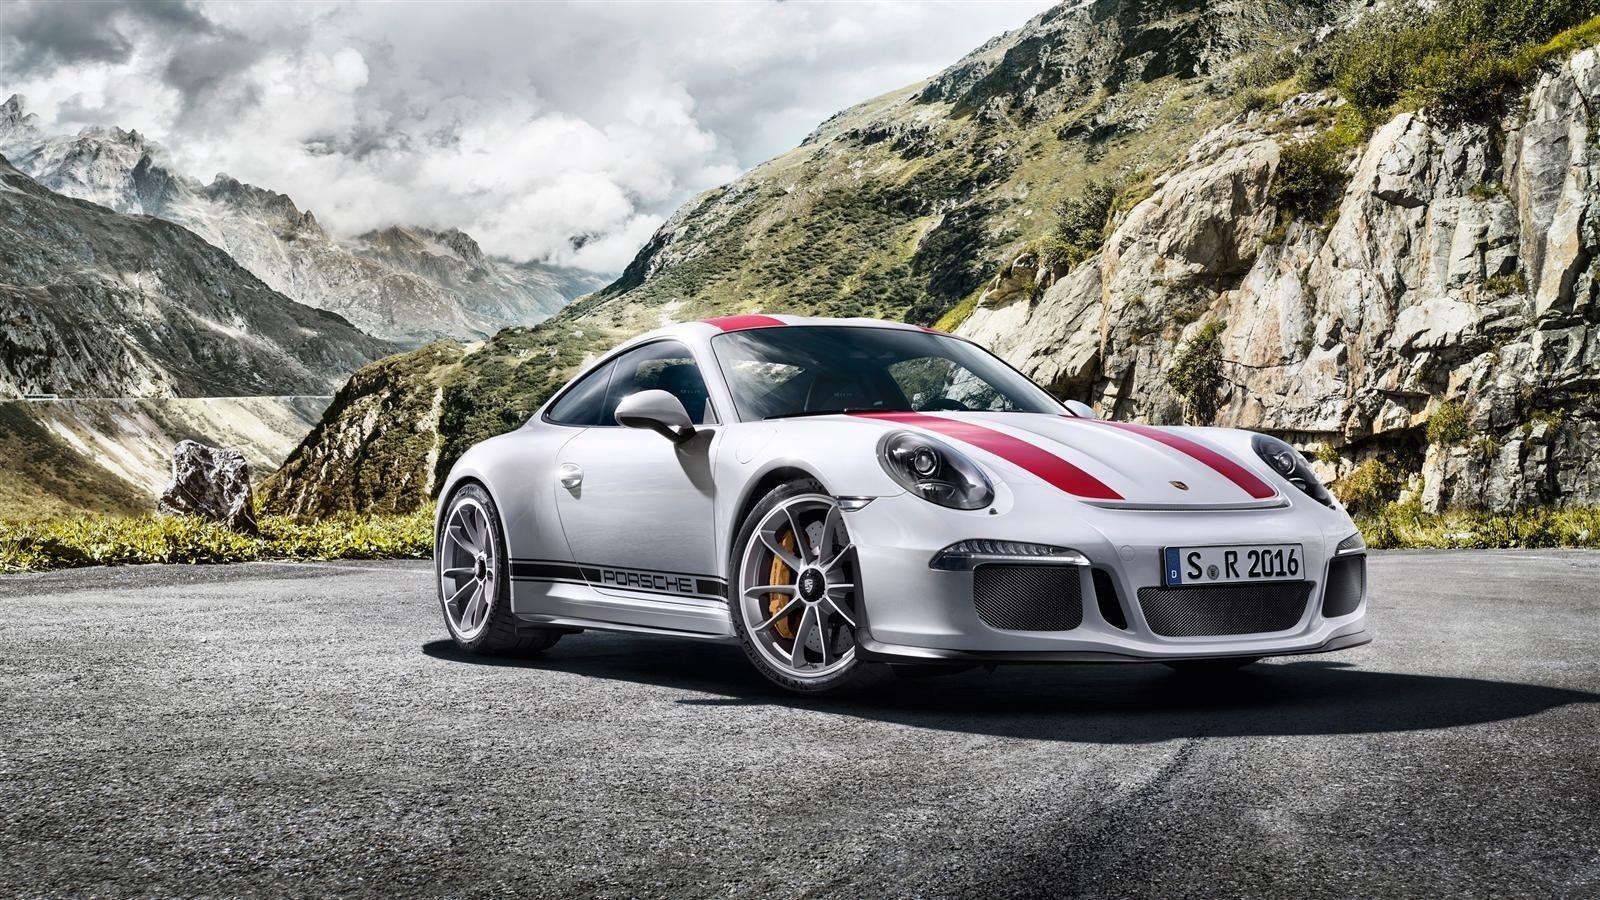 The 10 Most Beautiful Cars From The Geneva Motor Show Porsche 911 Porsche Sports Cars Lamborghini